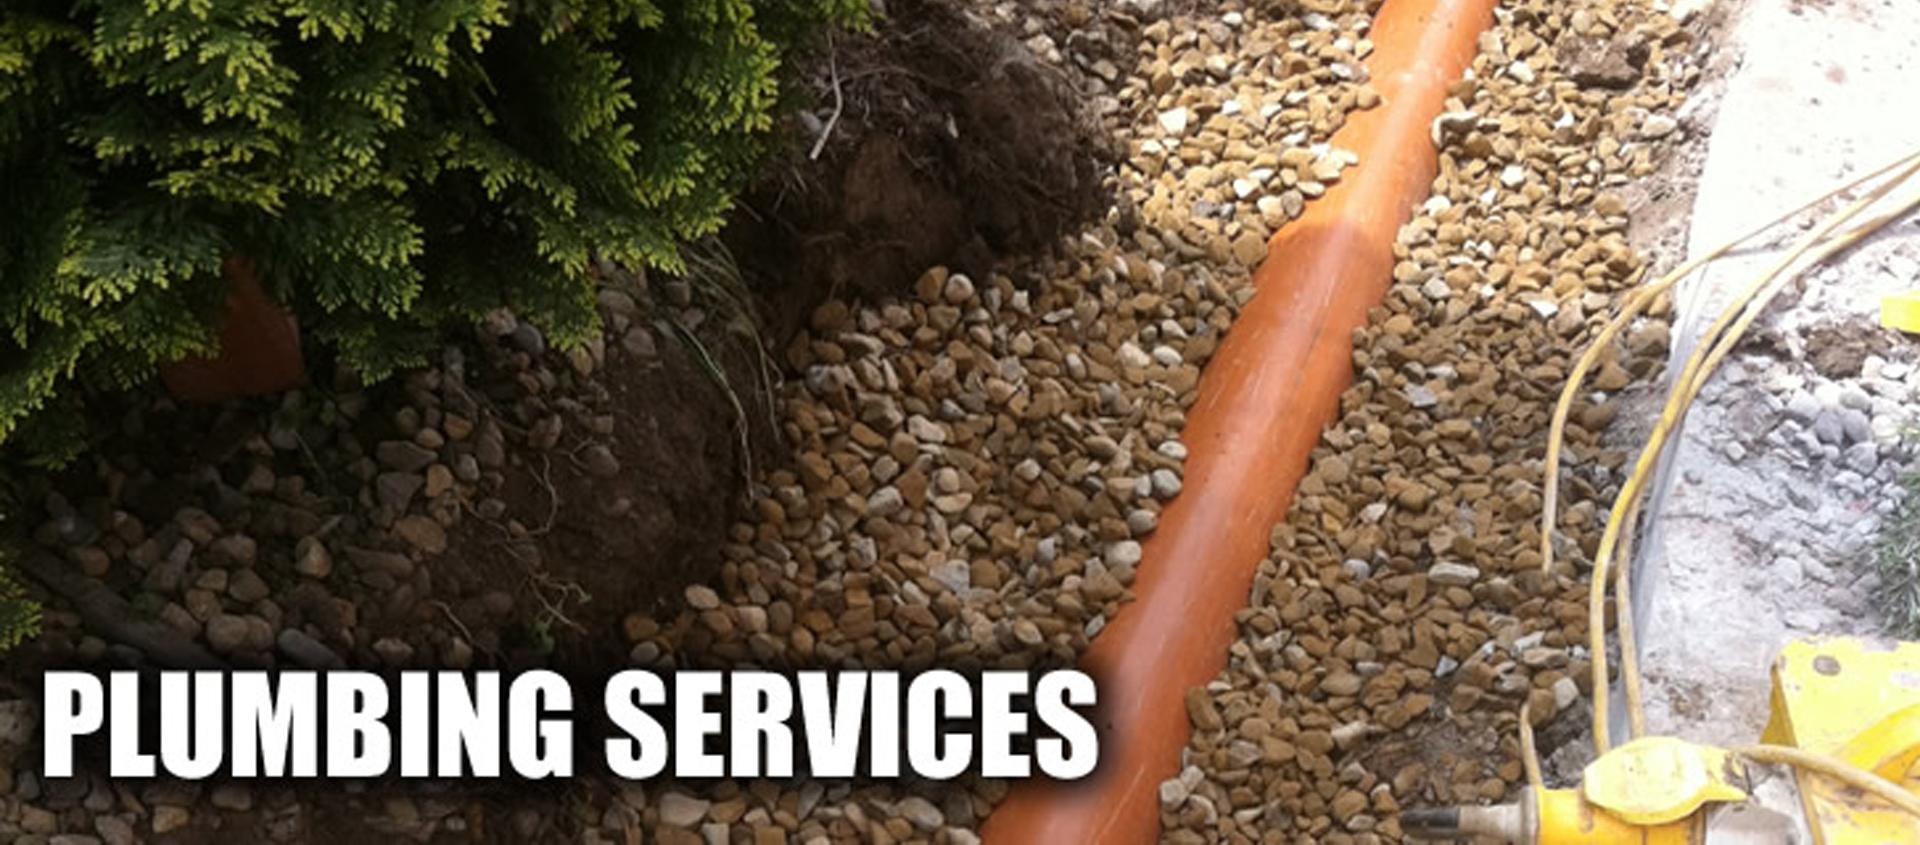 http://drainageservicesteesside.co.uk/wp-content/uploads/2019/01/image-5.jpg